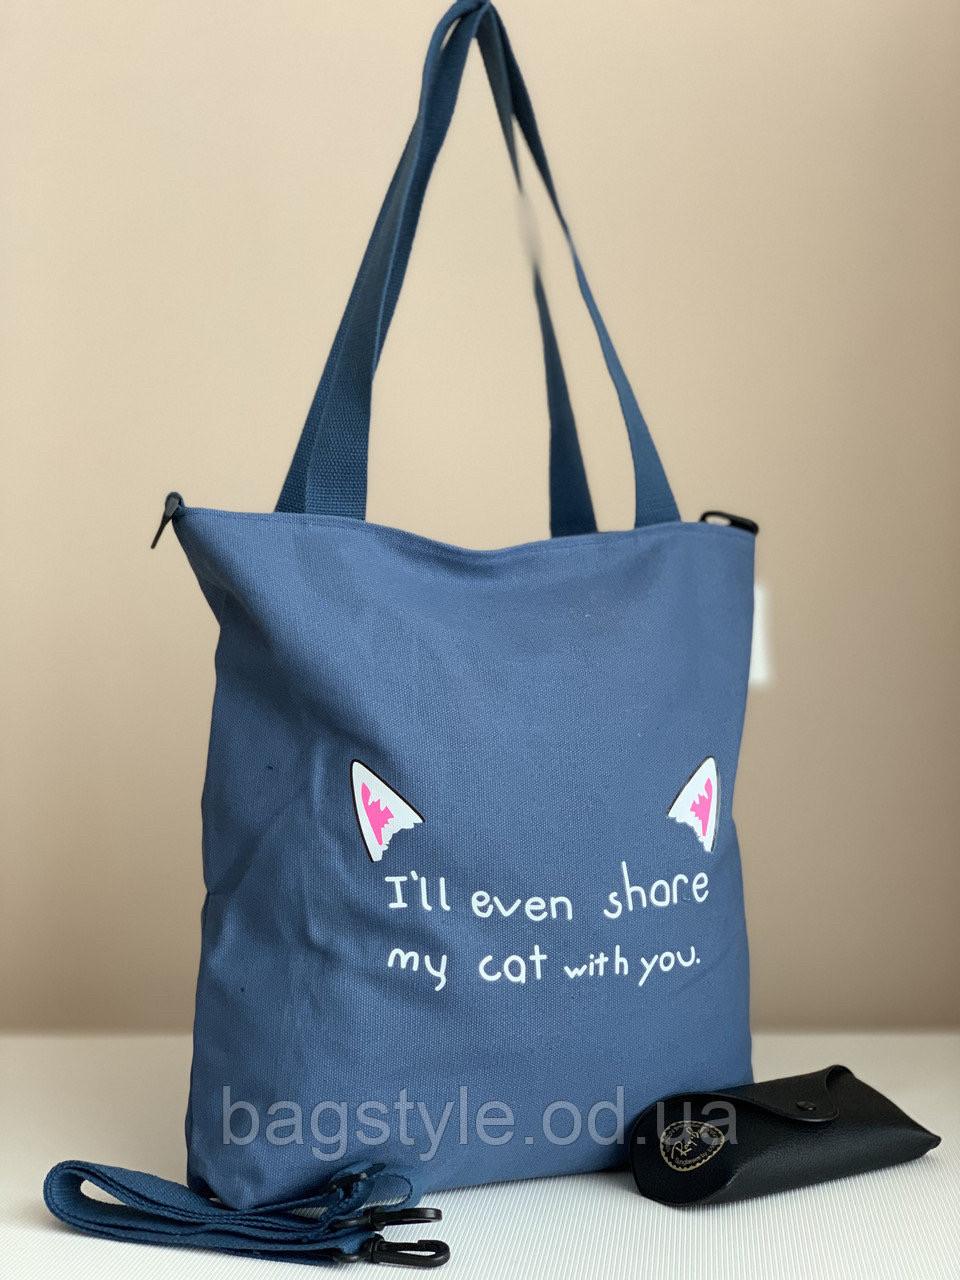 Тканинна синя еко сумка шоппер з бавовни